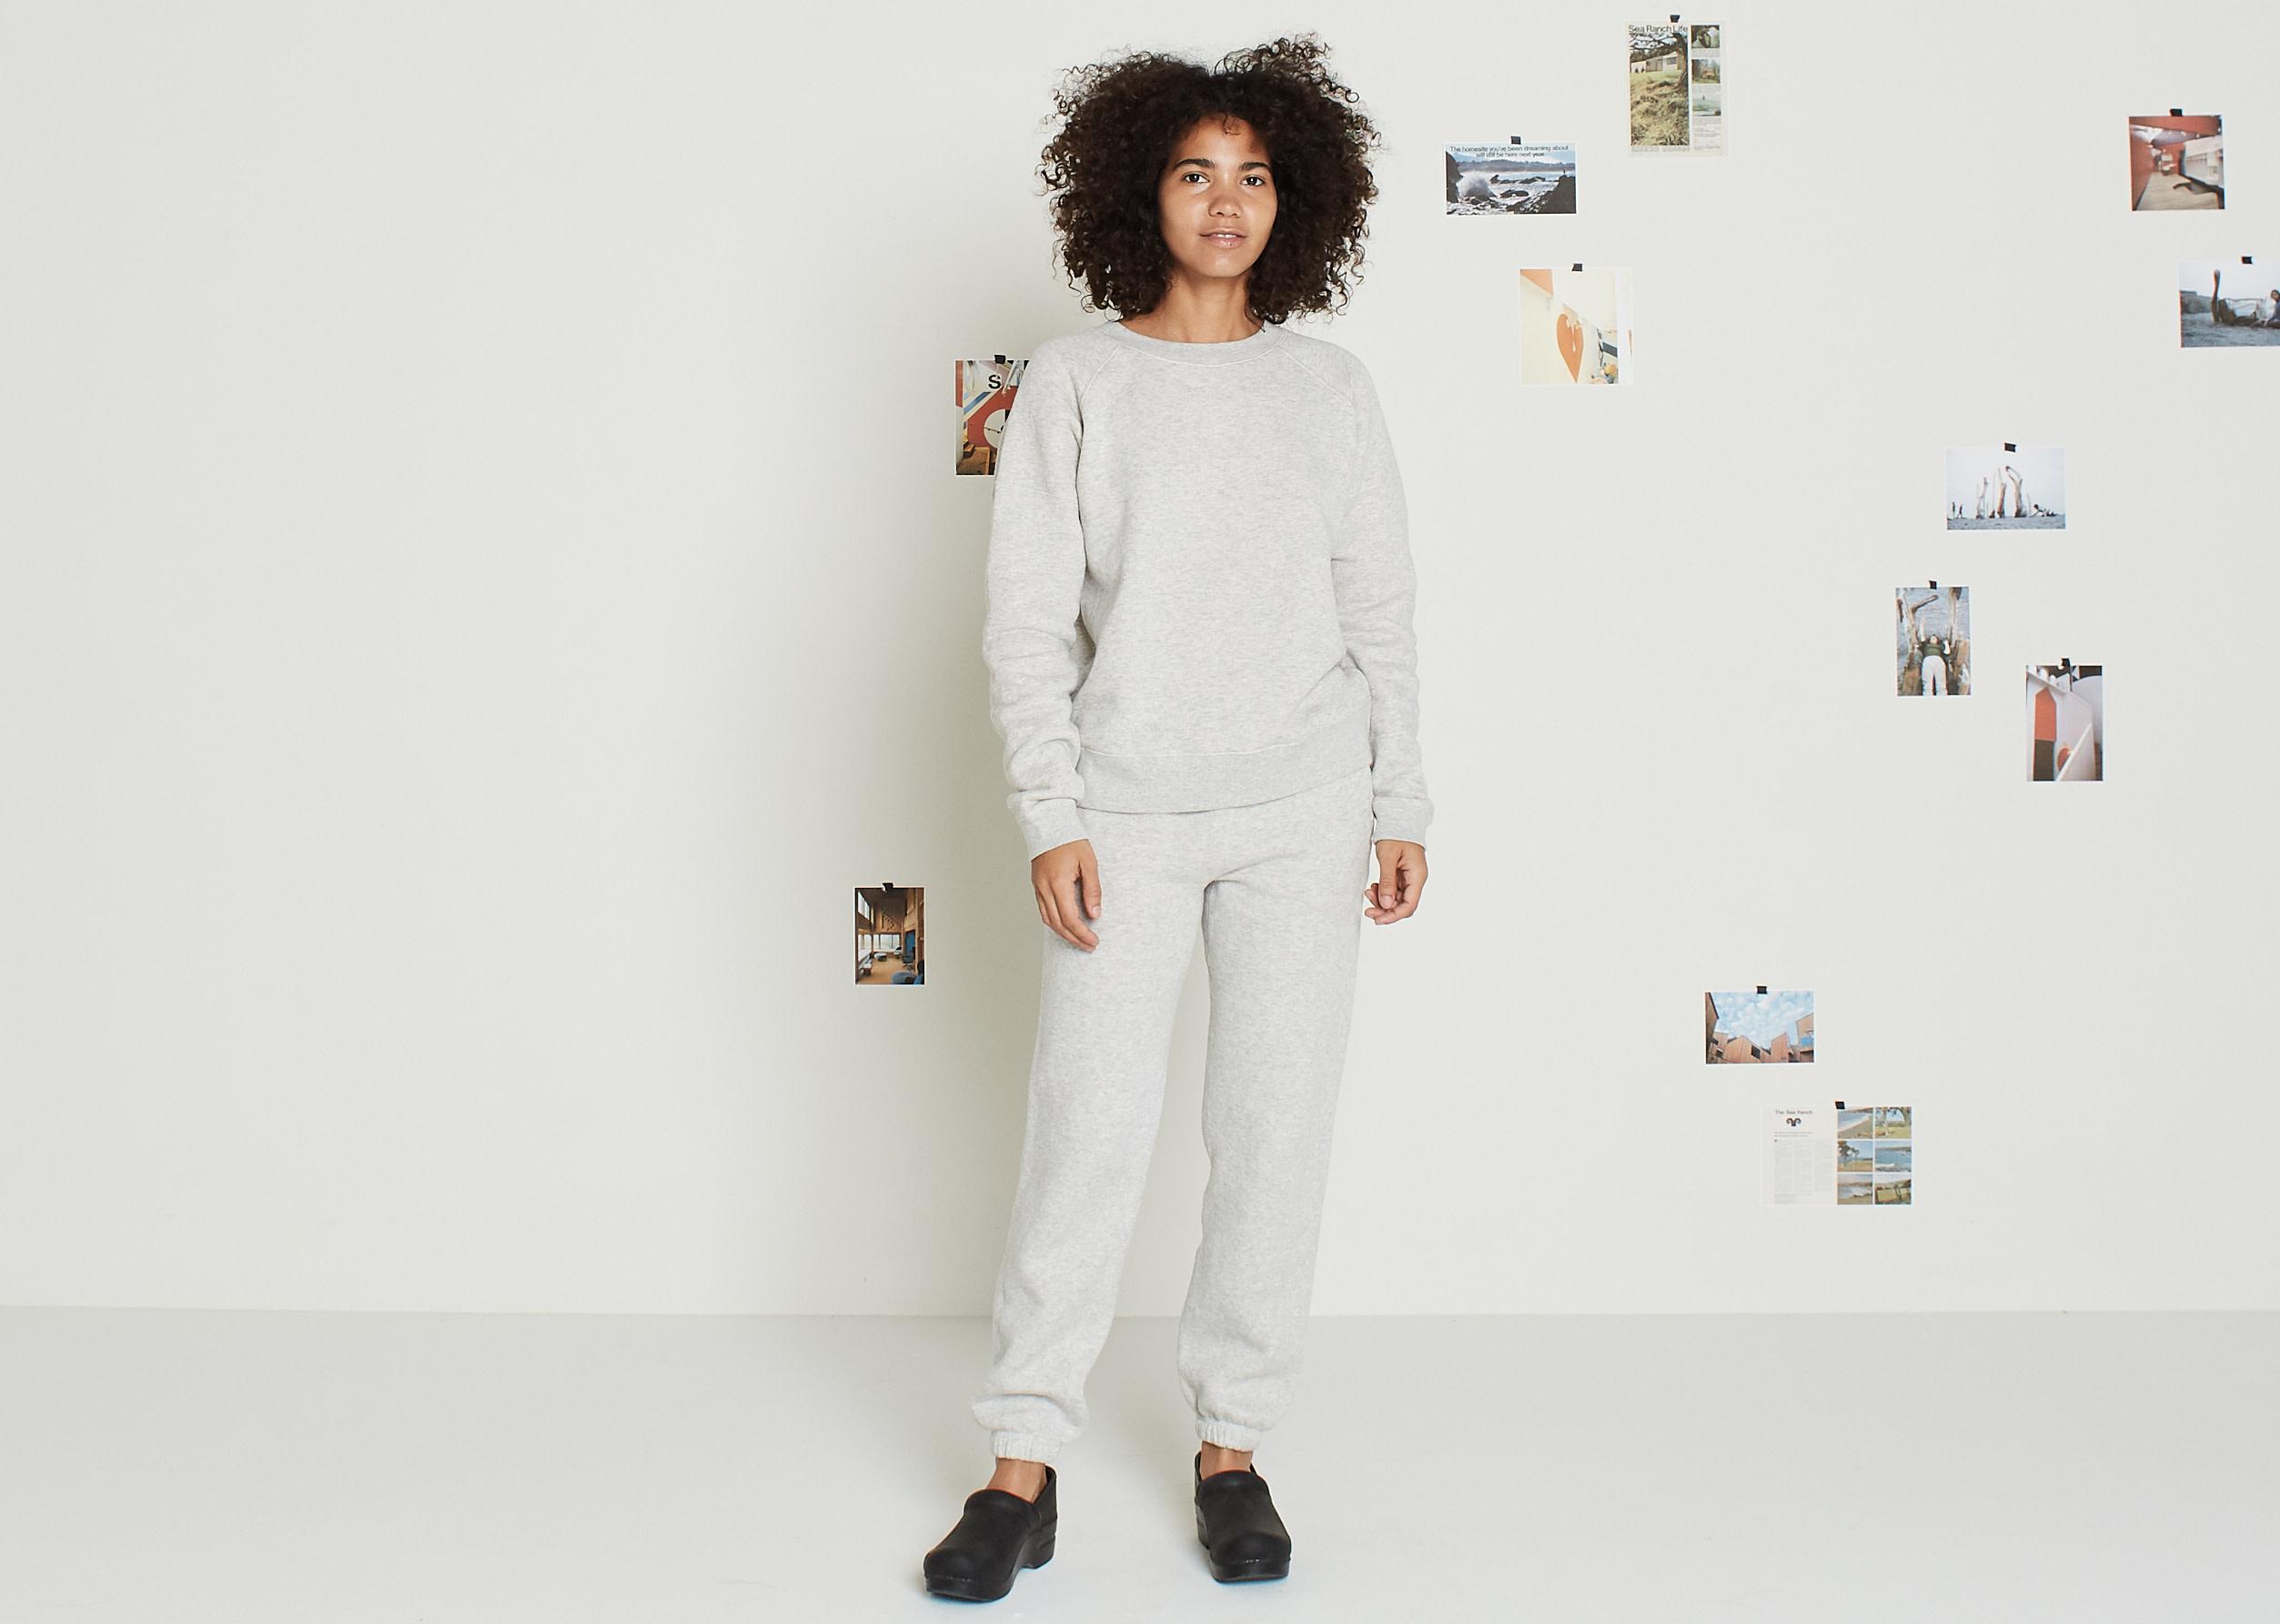 Zoë Kravitz Is Our Loungewear Icon